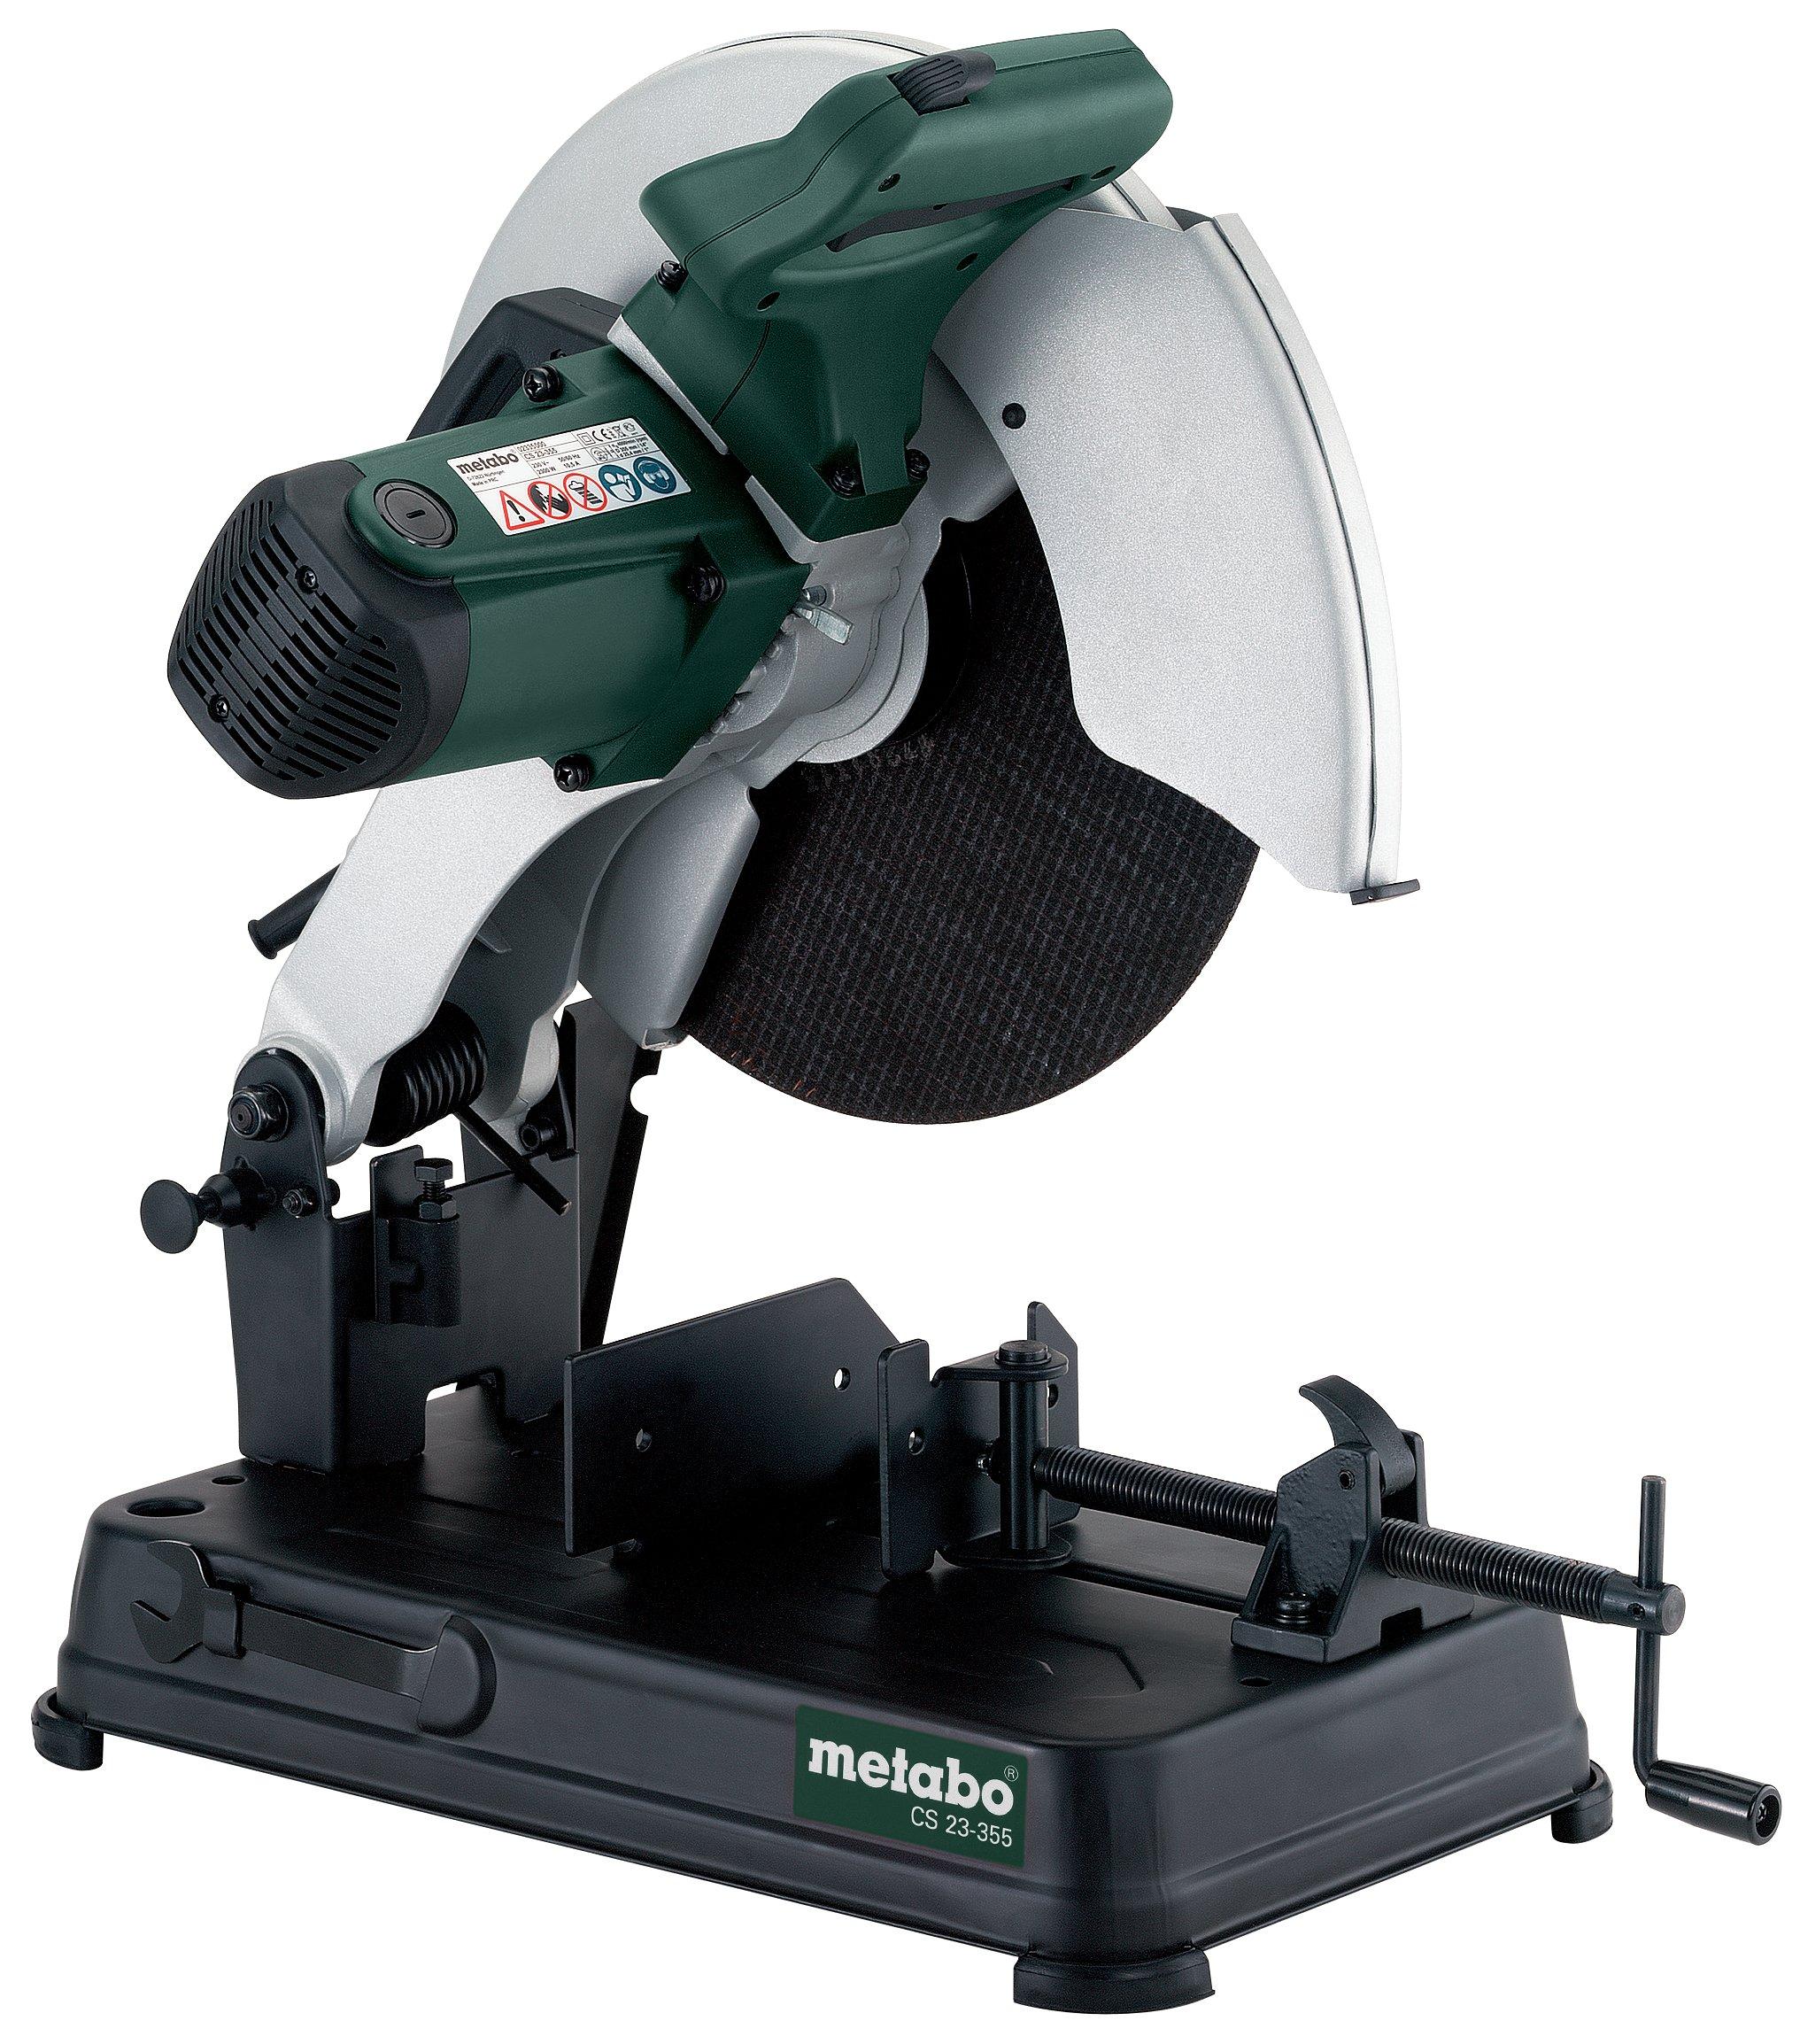 Metabo CS23-355 602335000 15-Amp 14-Inch Metal Chop Saw